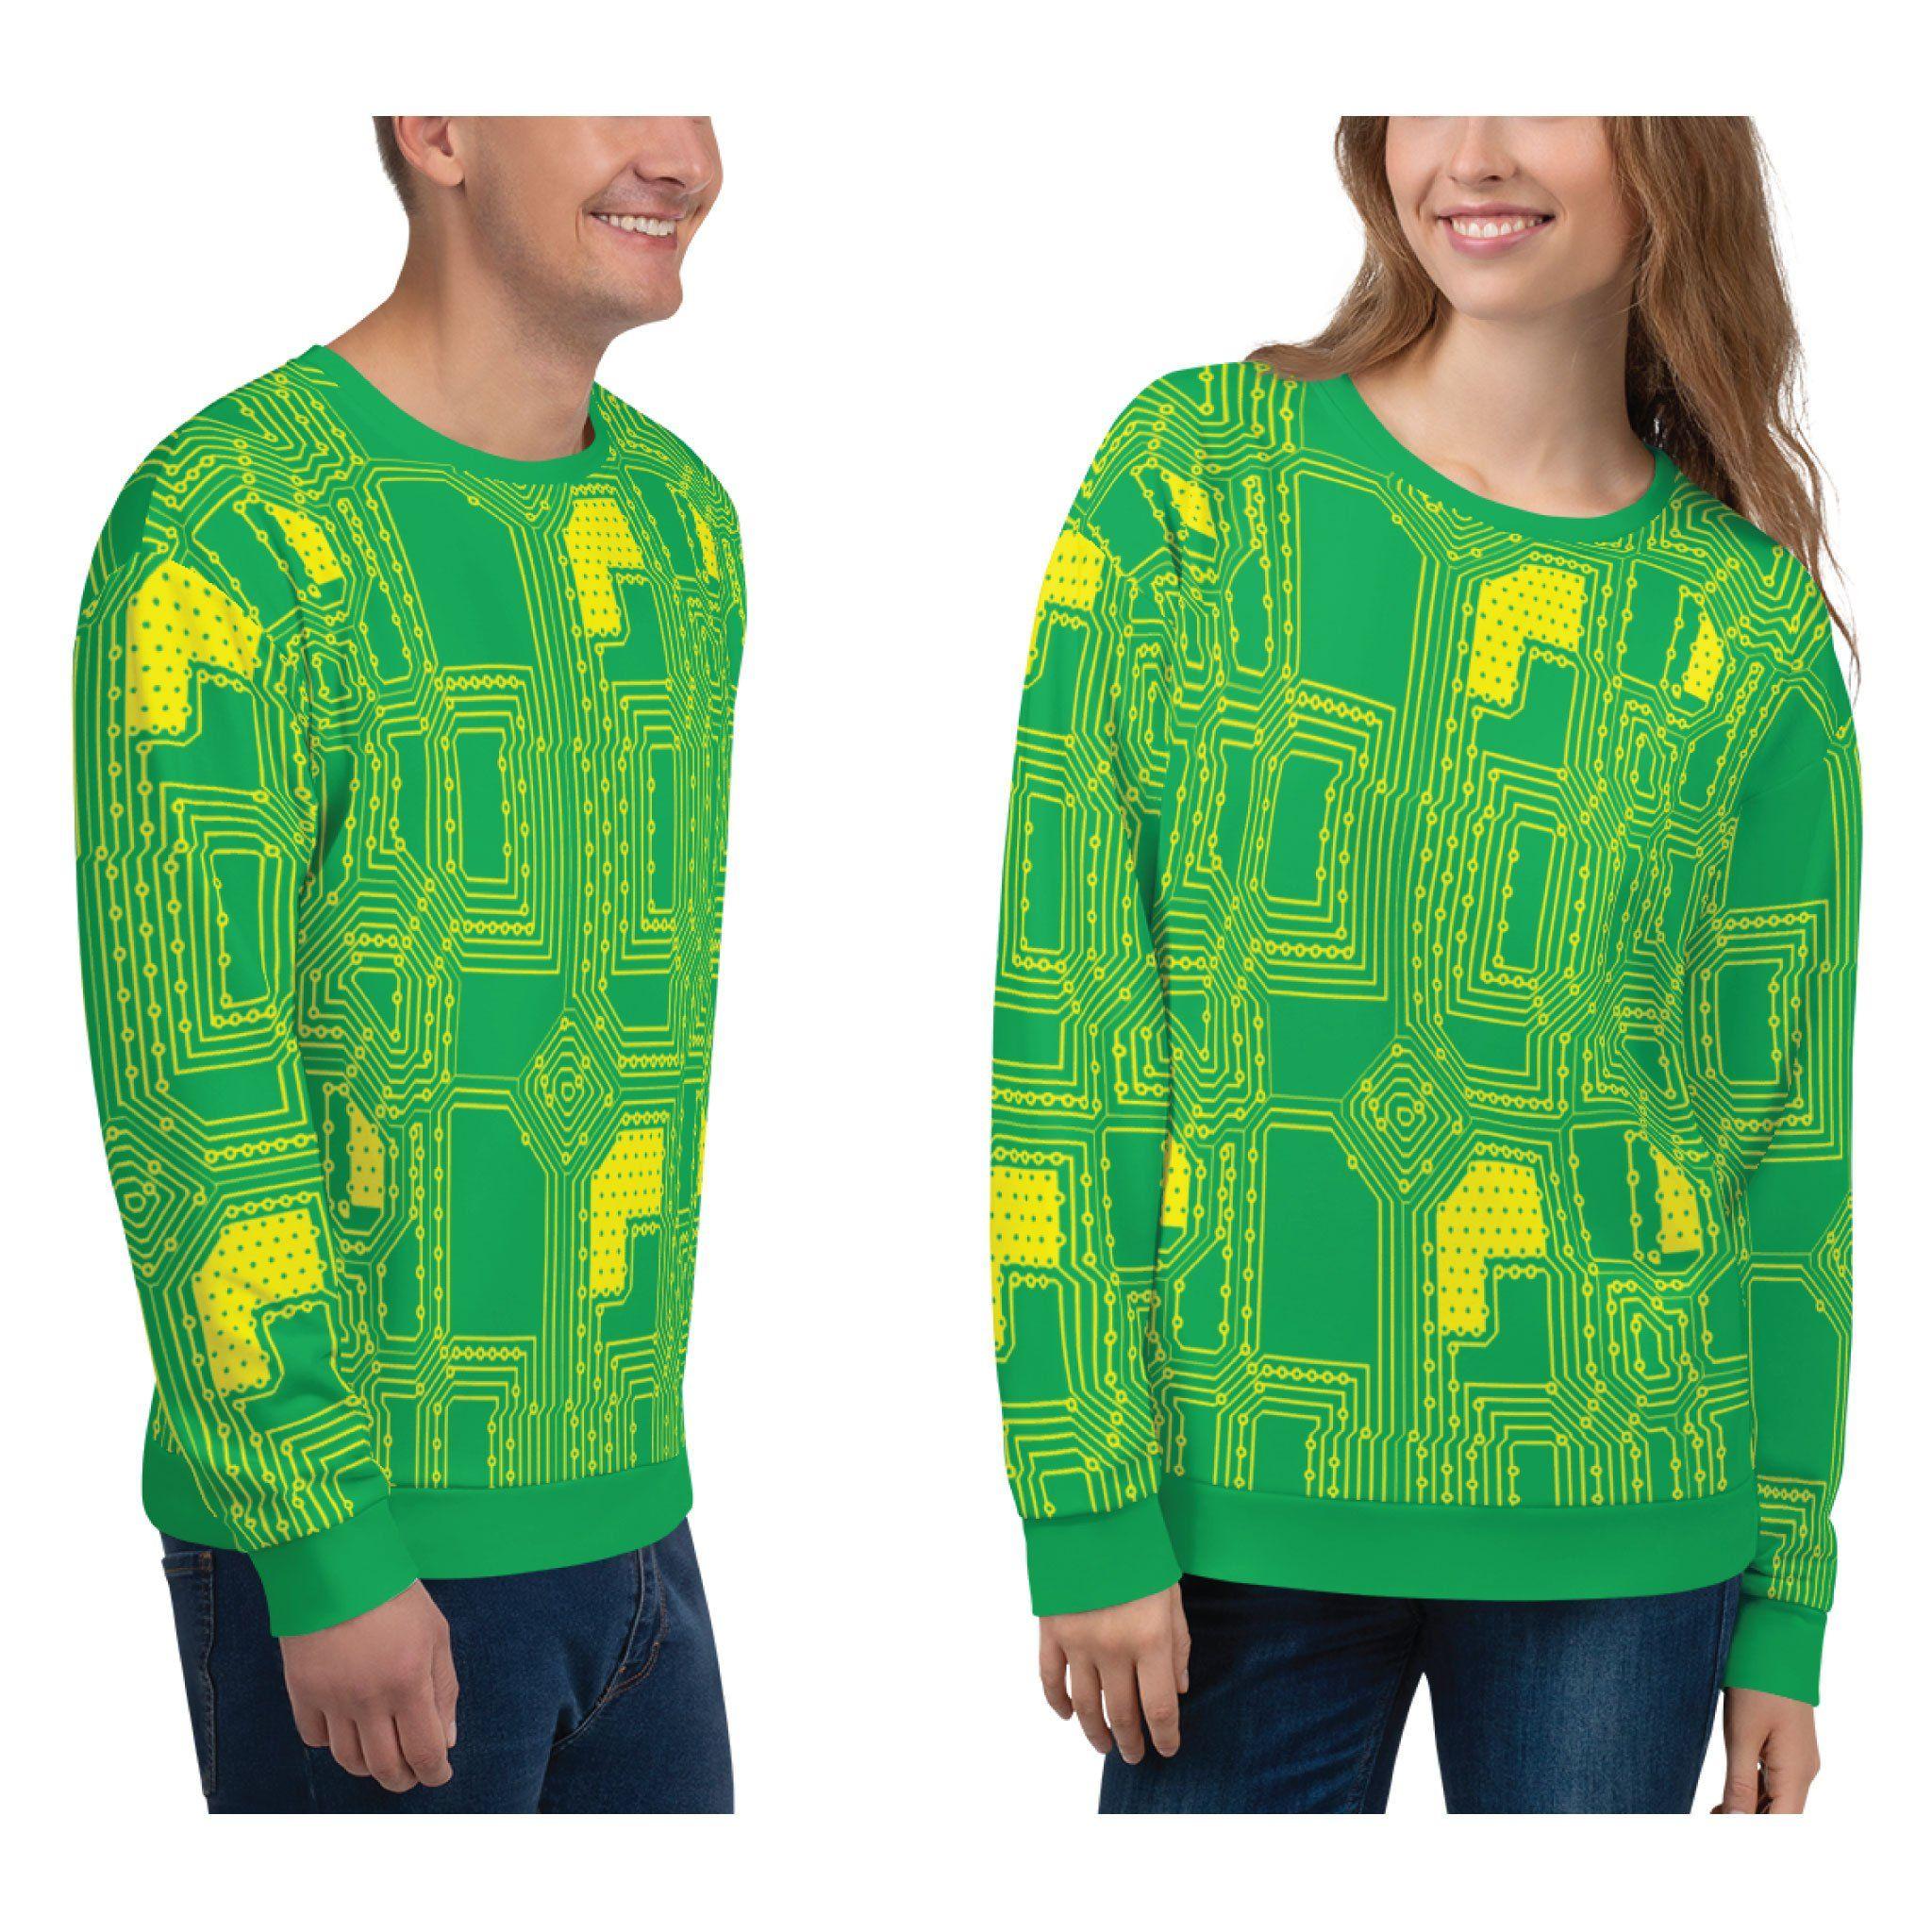 Circuit Board Tshirts